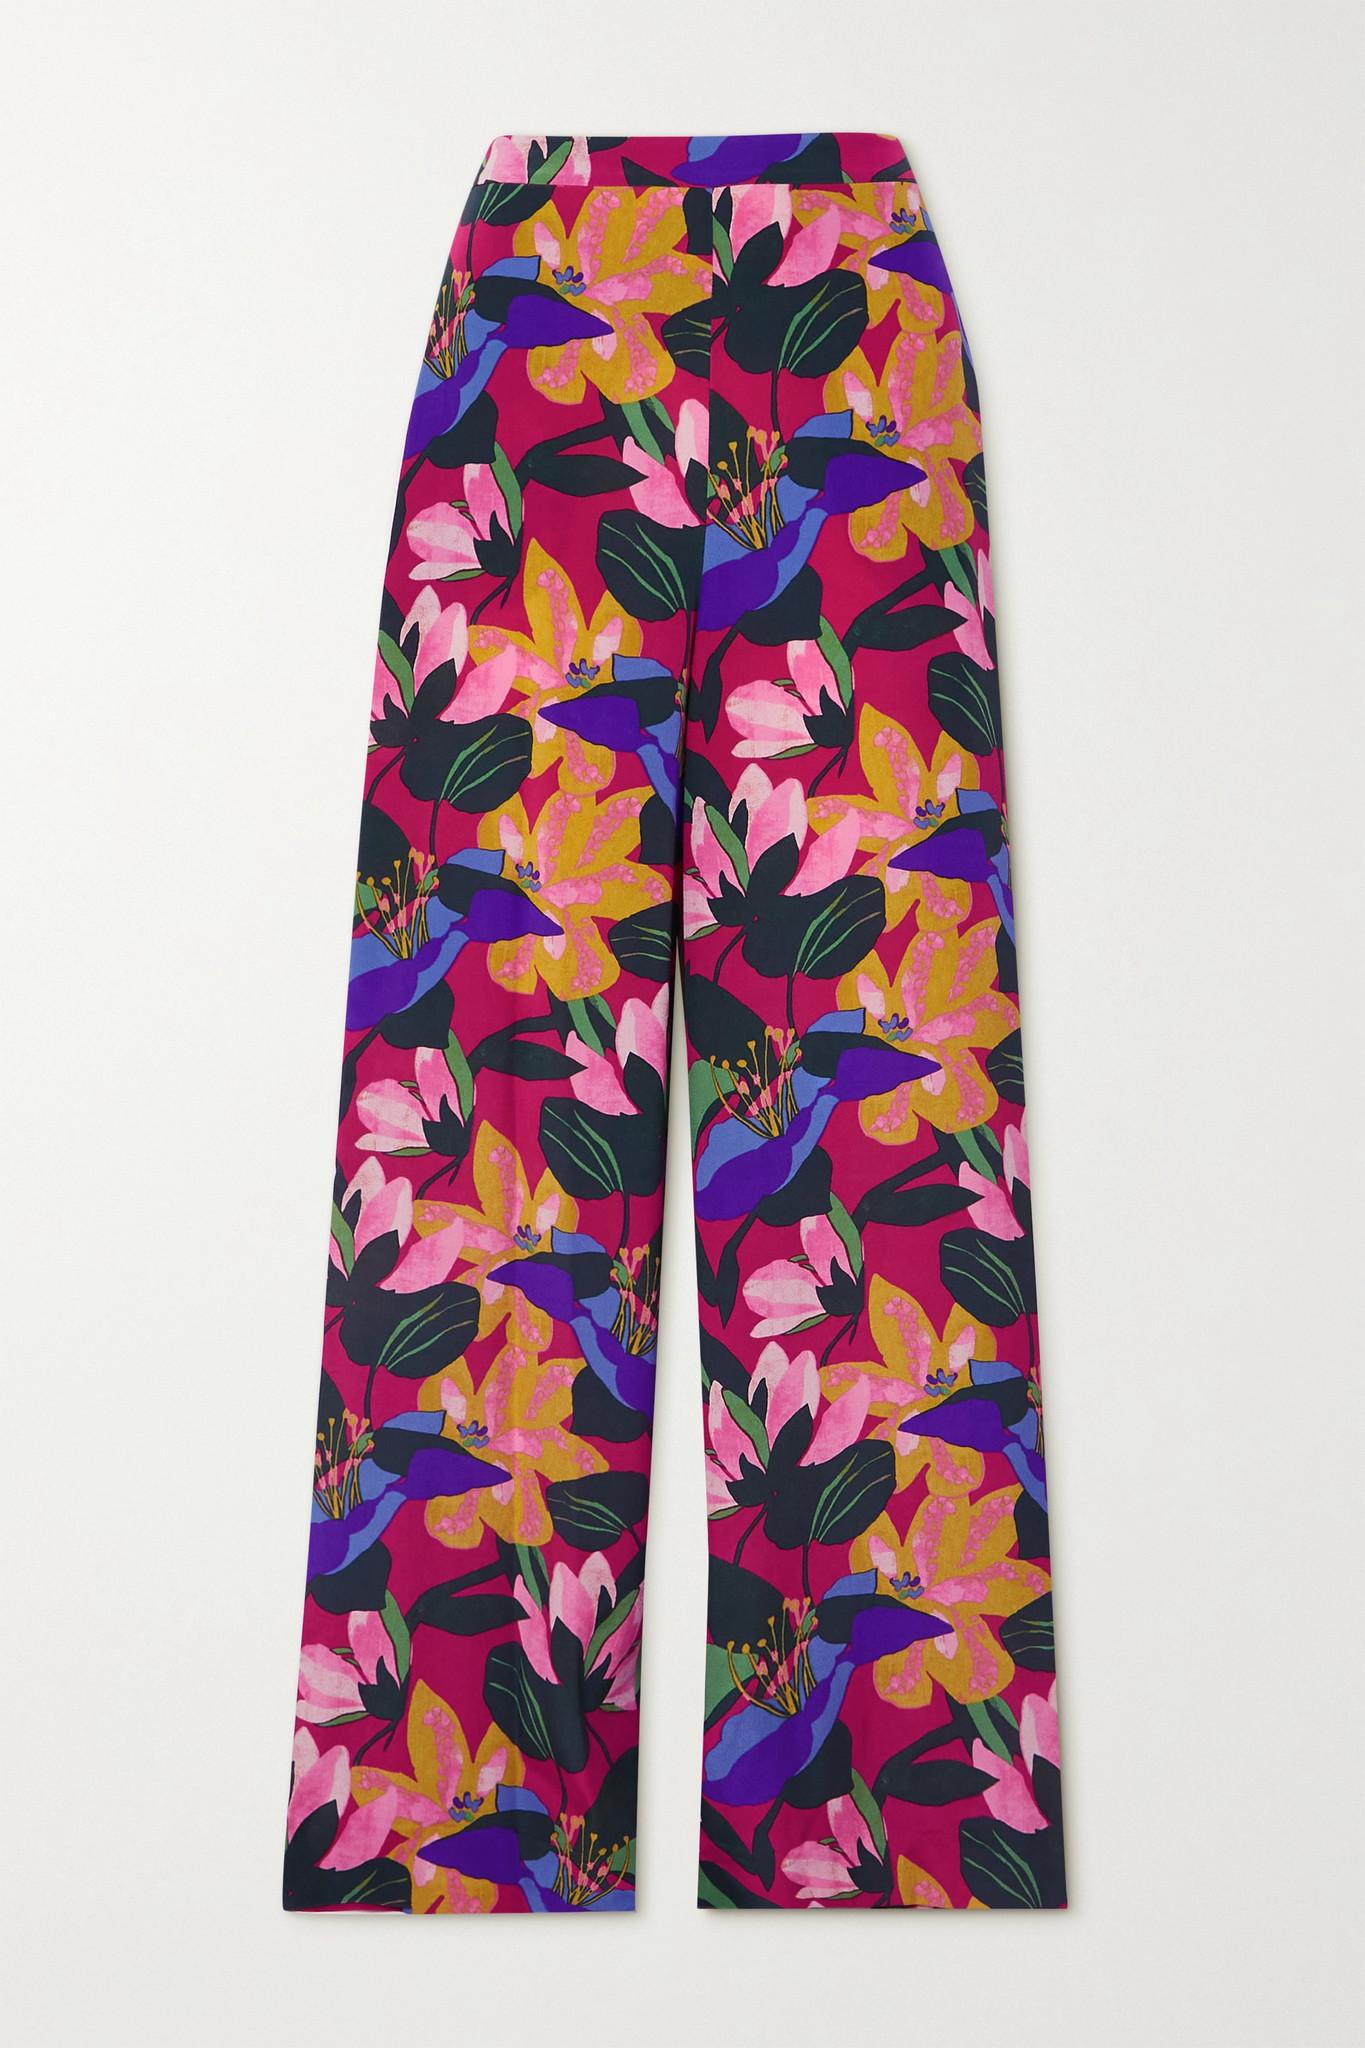 DIANE VON FURSTENBERG - Pauline Floral-print Silk Crepe De Chine Wide-leg Pants - Pink - US8